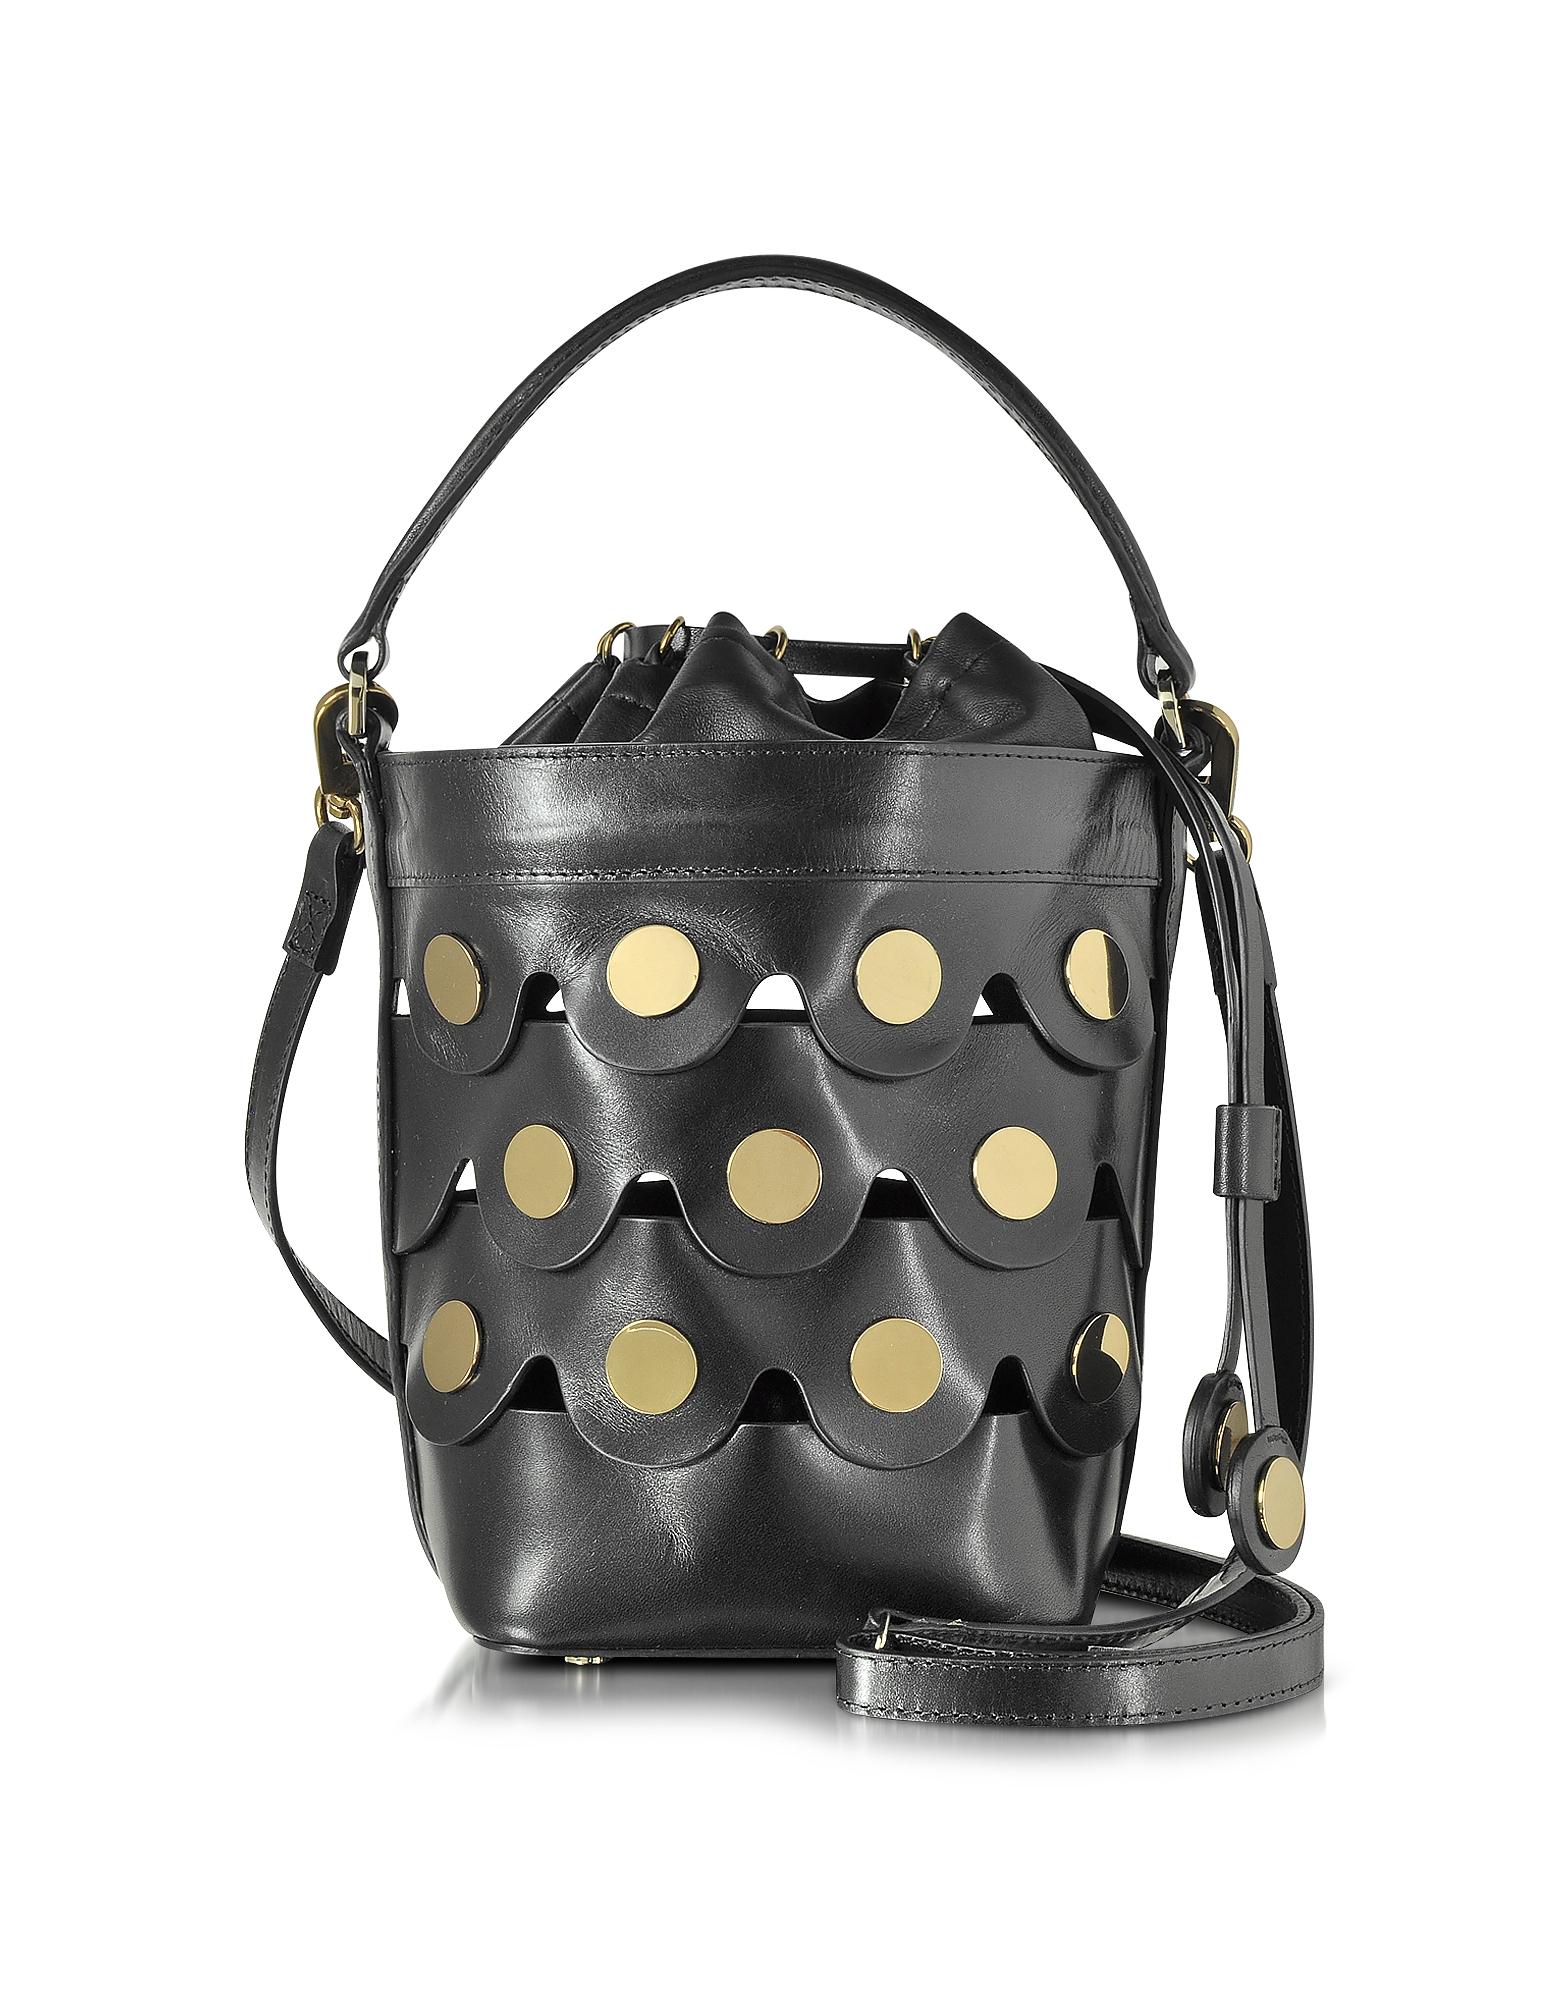 Pierre Hardy Handbags, Black Leather Penny Bucket Bag w/Golden Studs